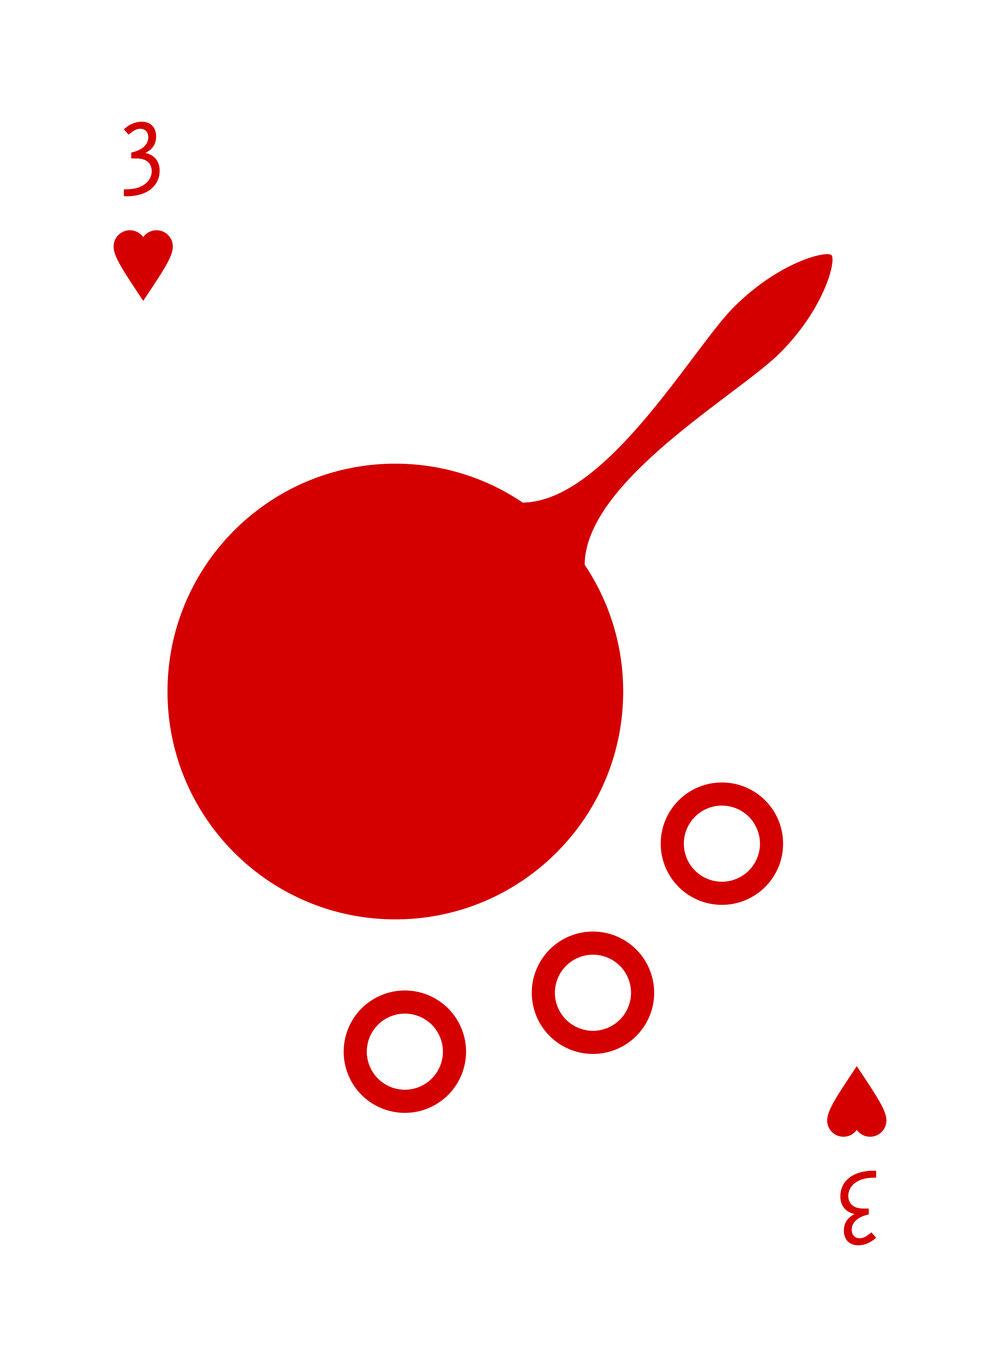 52_2__0023_Hearts_3.jpg